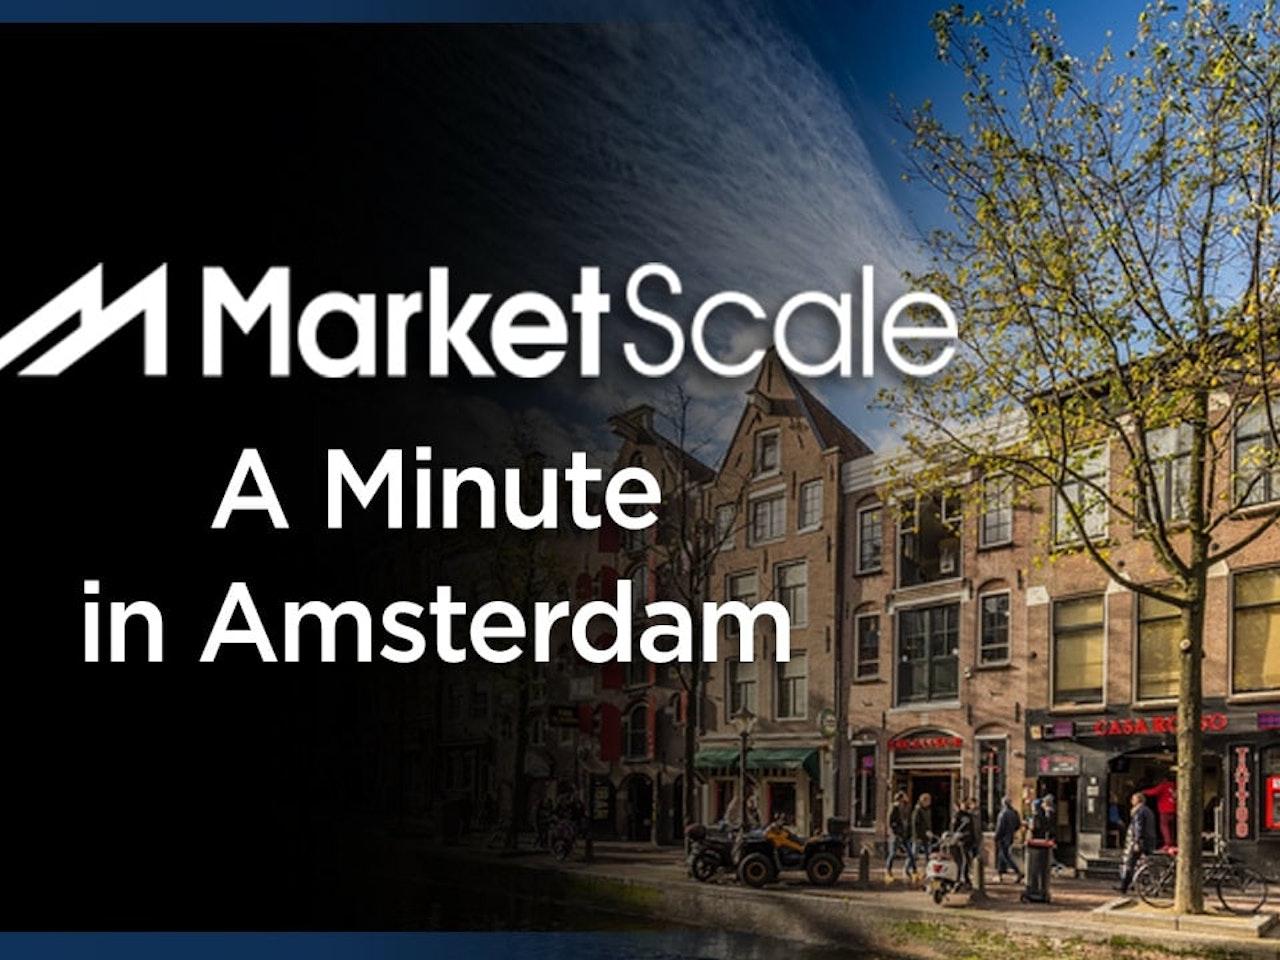 A Minute in Amsterdam